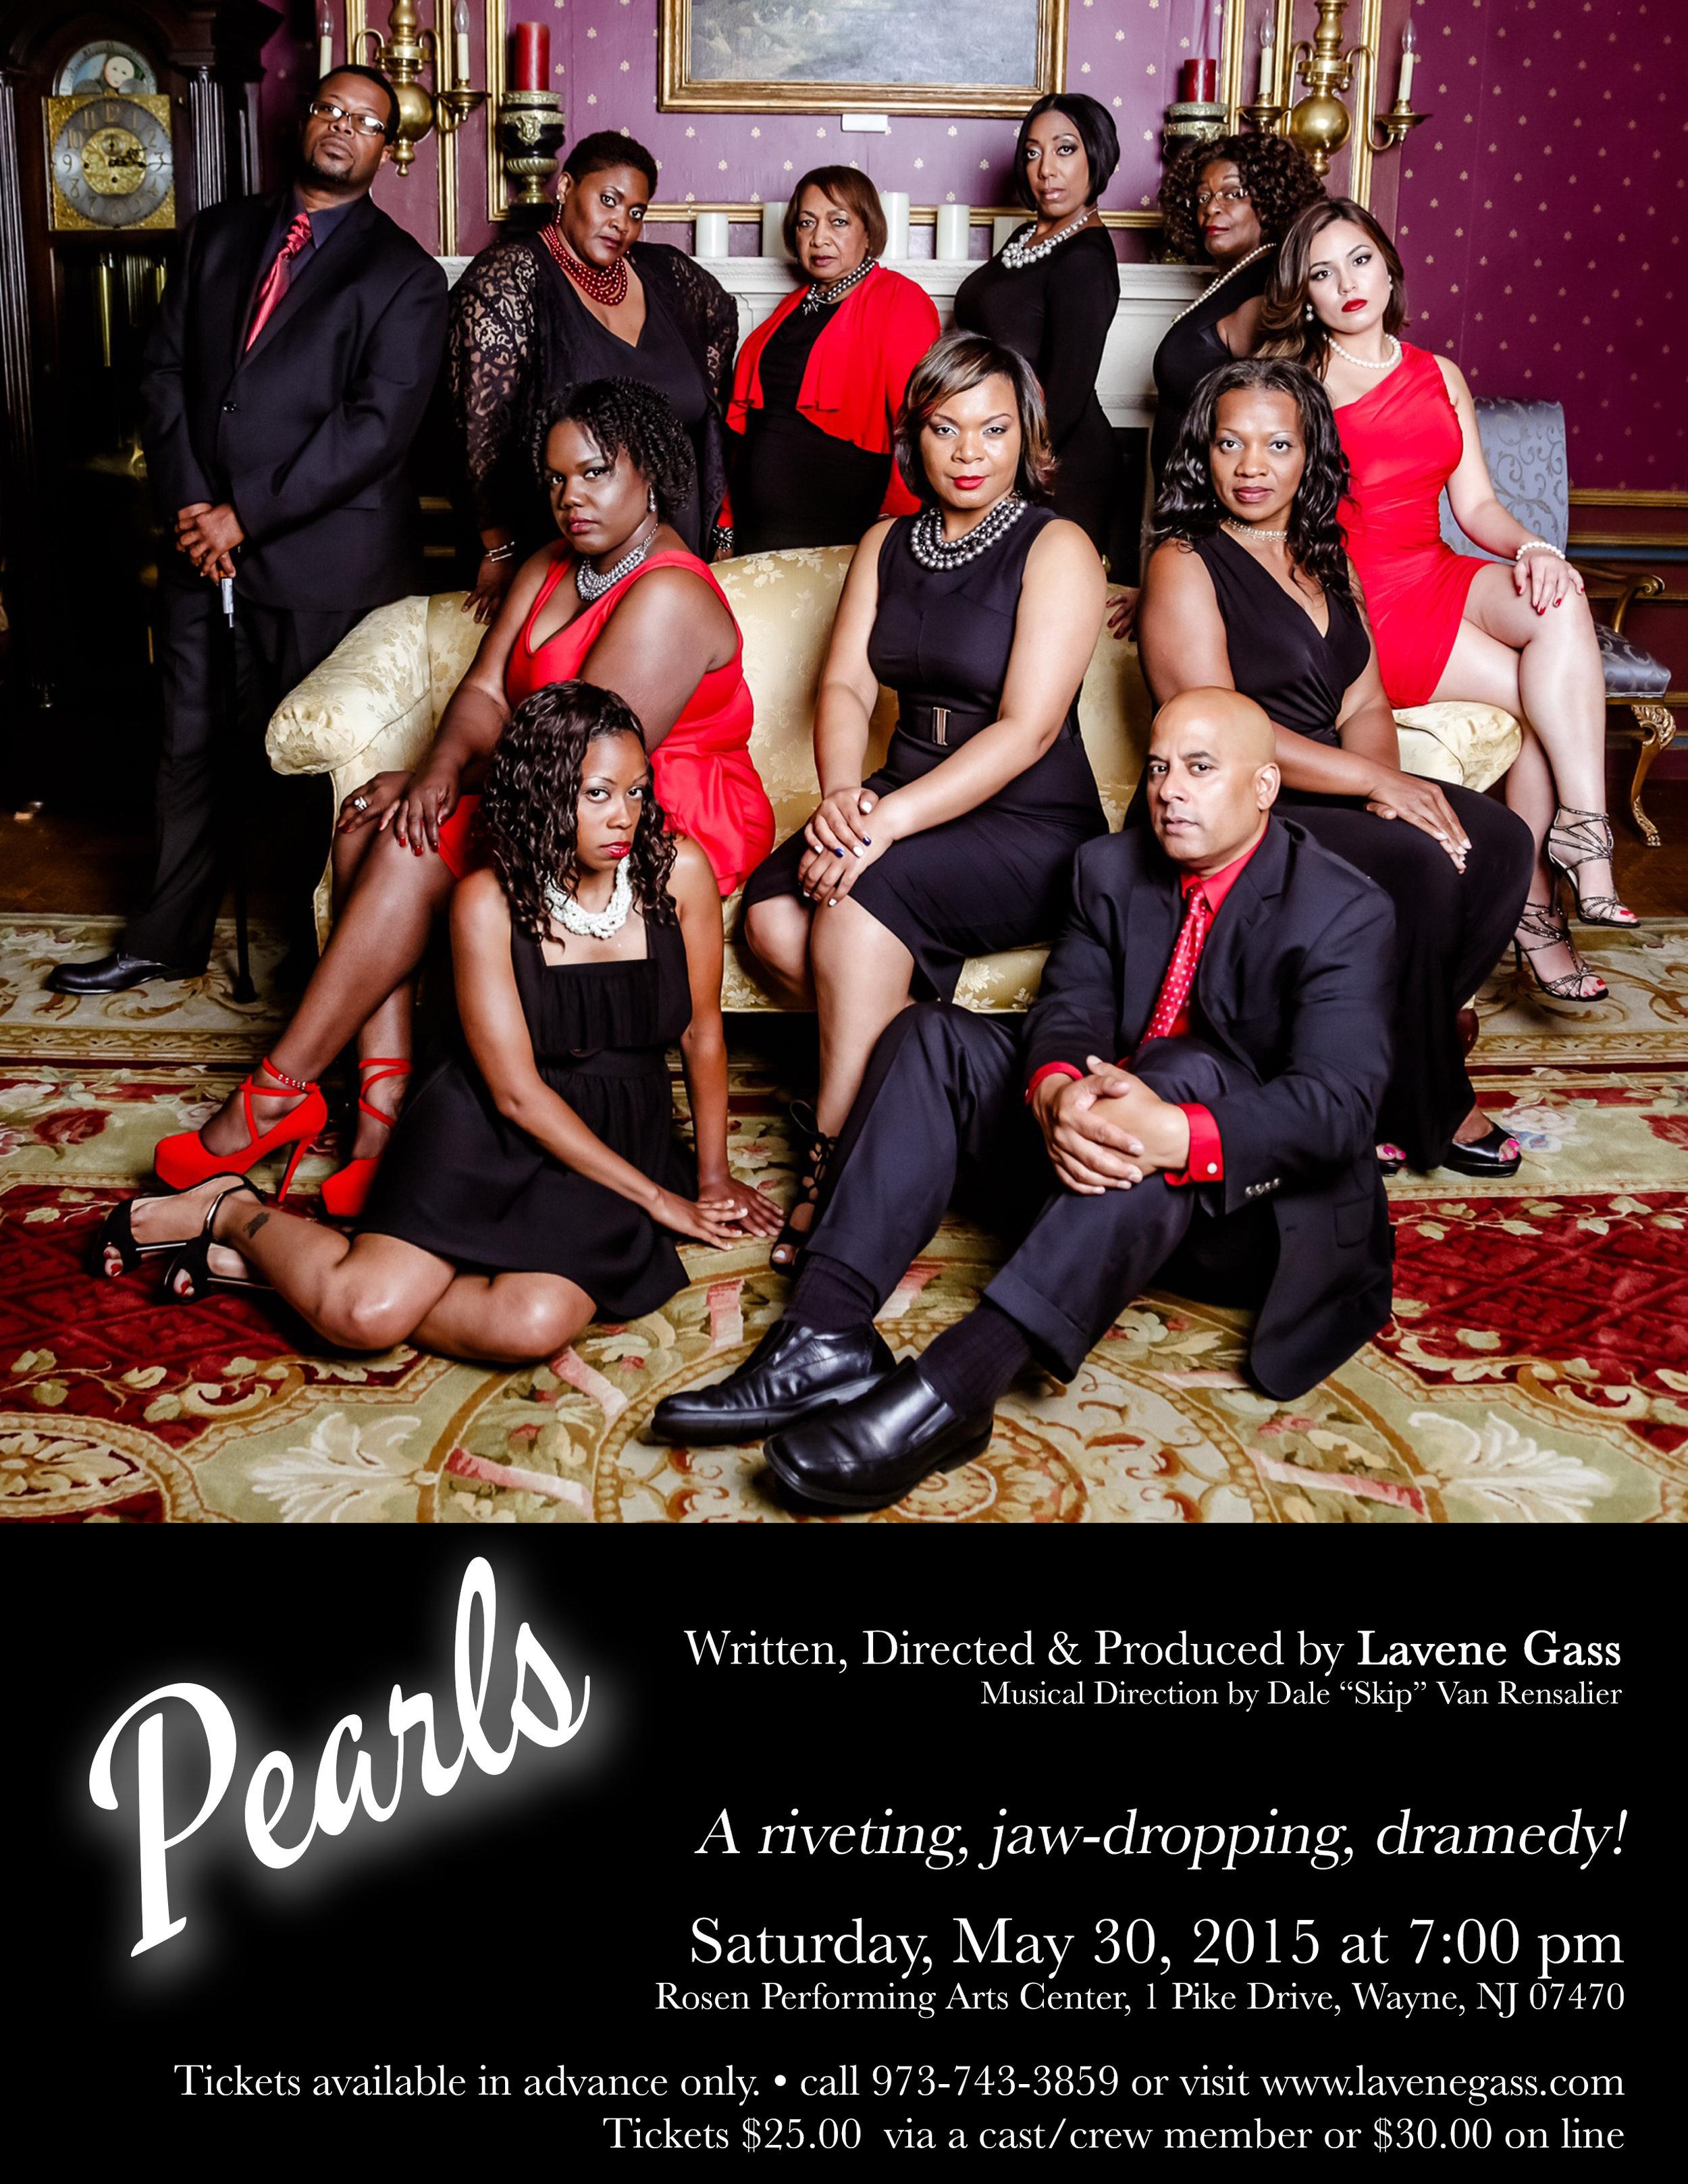 PearlsFlyer-1.jpg